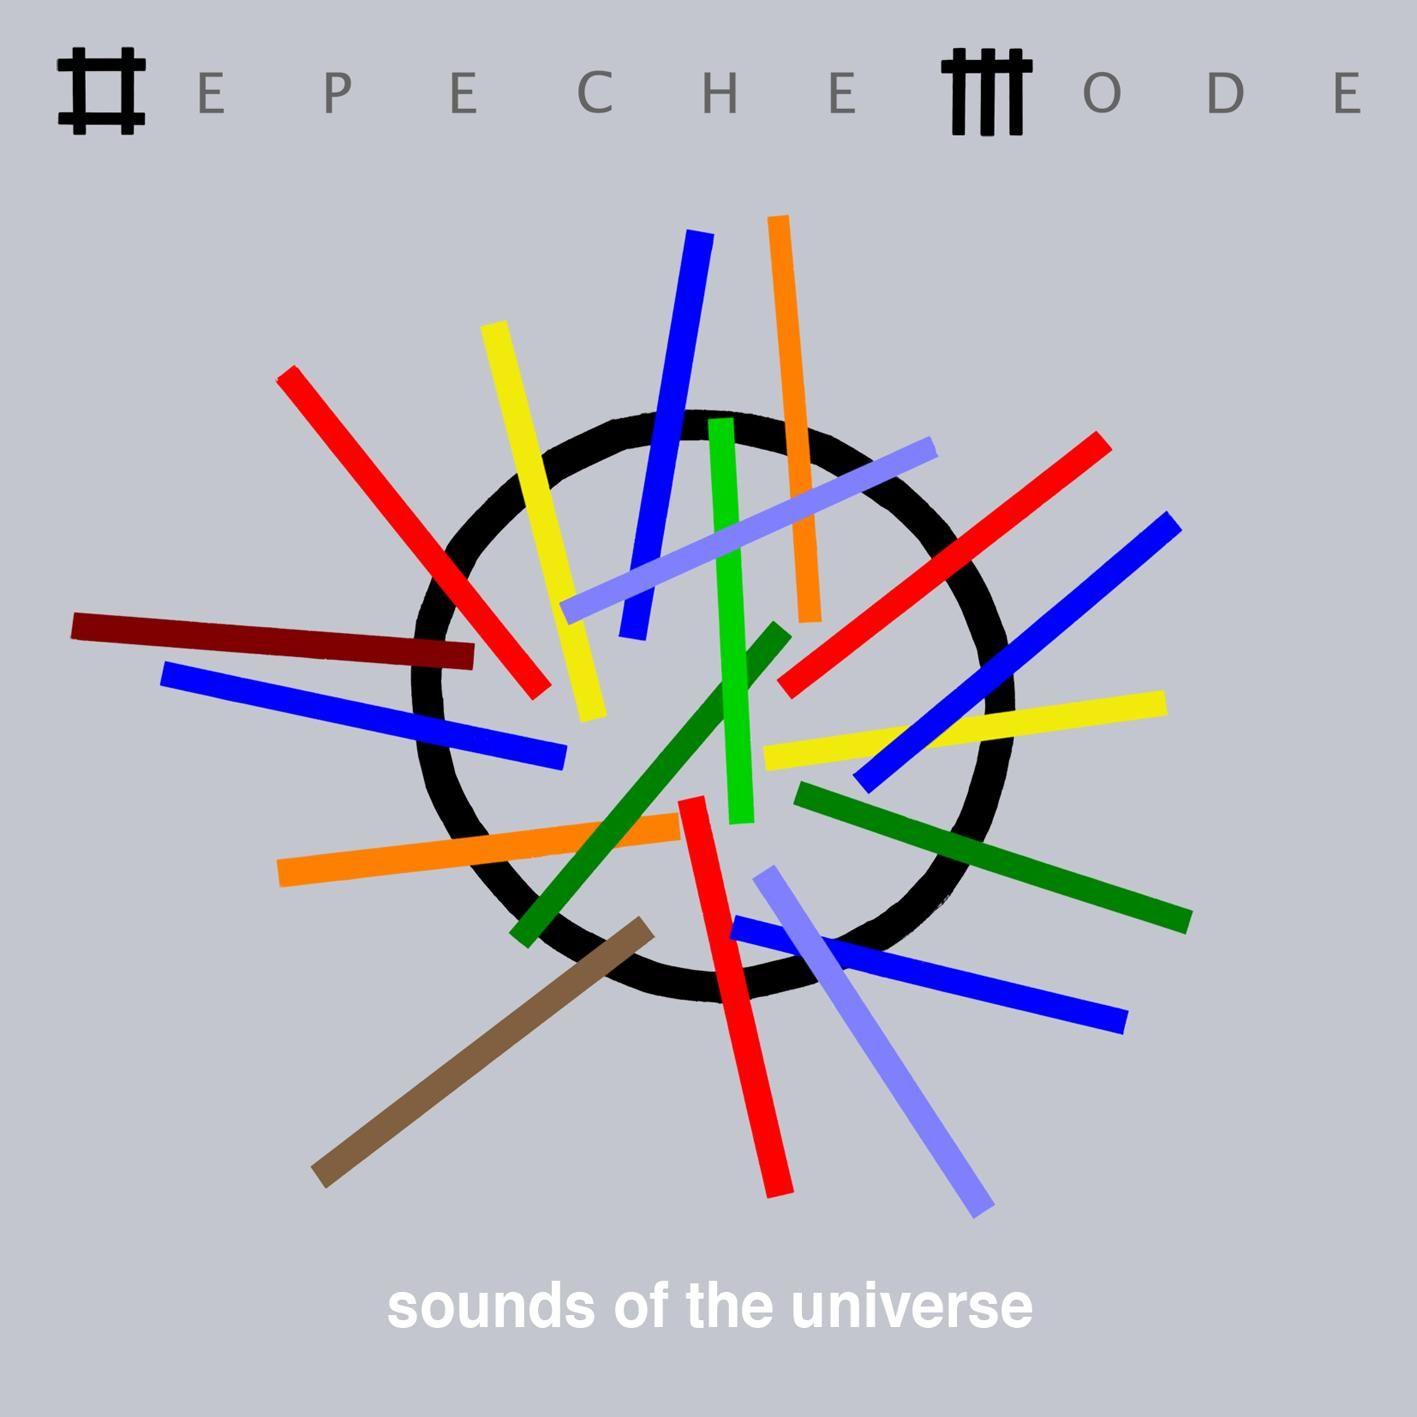 Depeche Mode - Sounds Of The Universe album cover